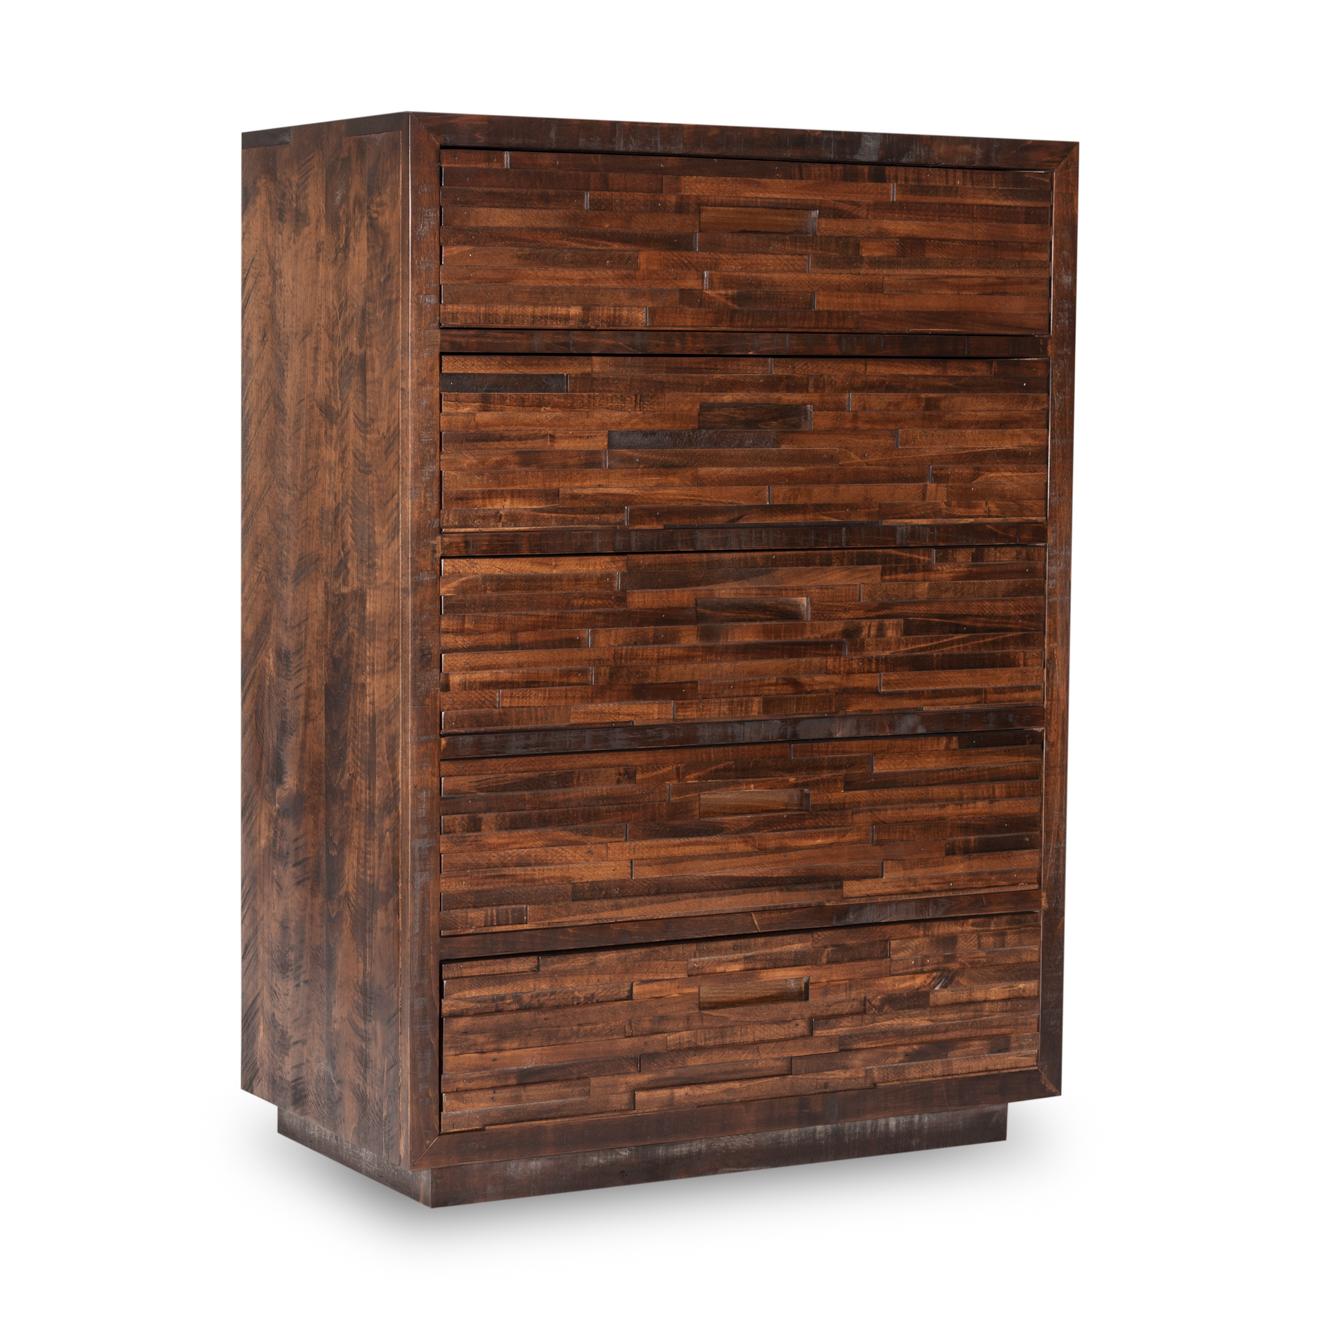 008_Woodcraft_Furniture_GreatLakesHiBoy_FrtQtrA-4.jpg